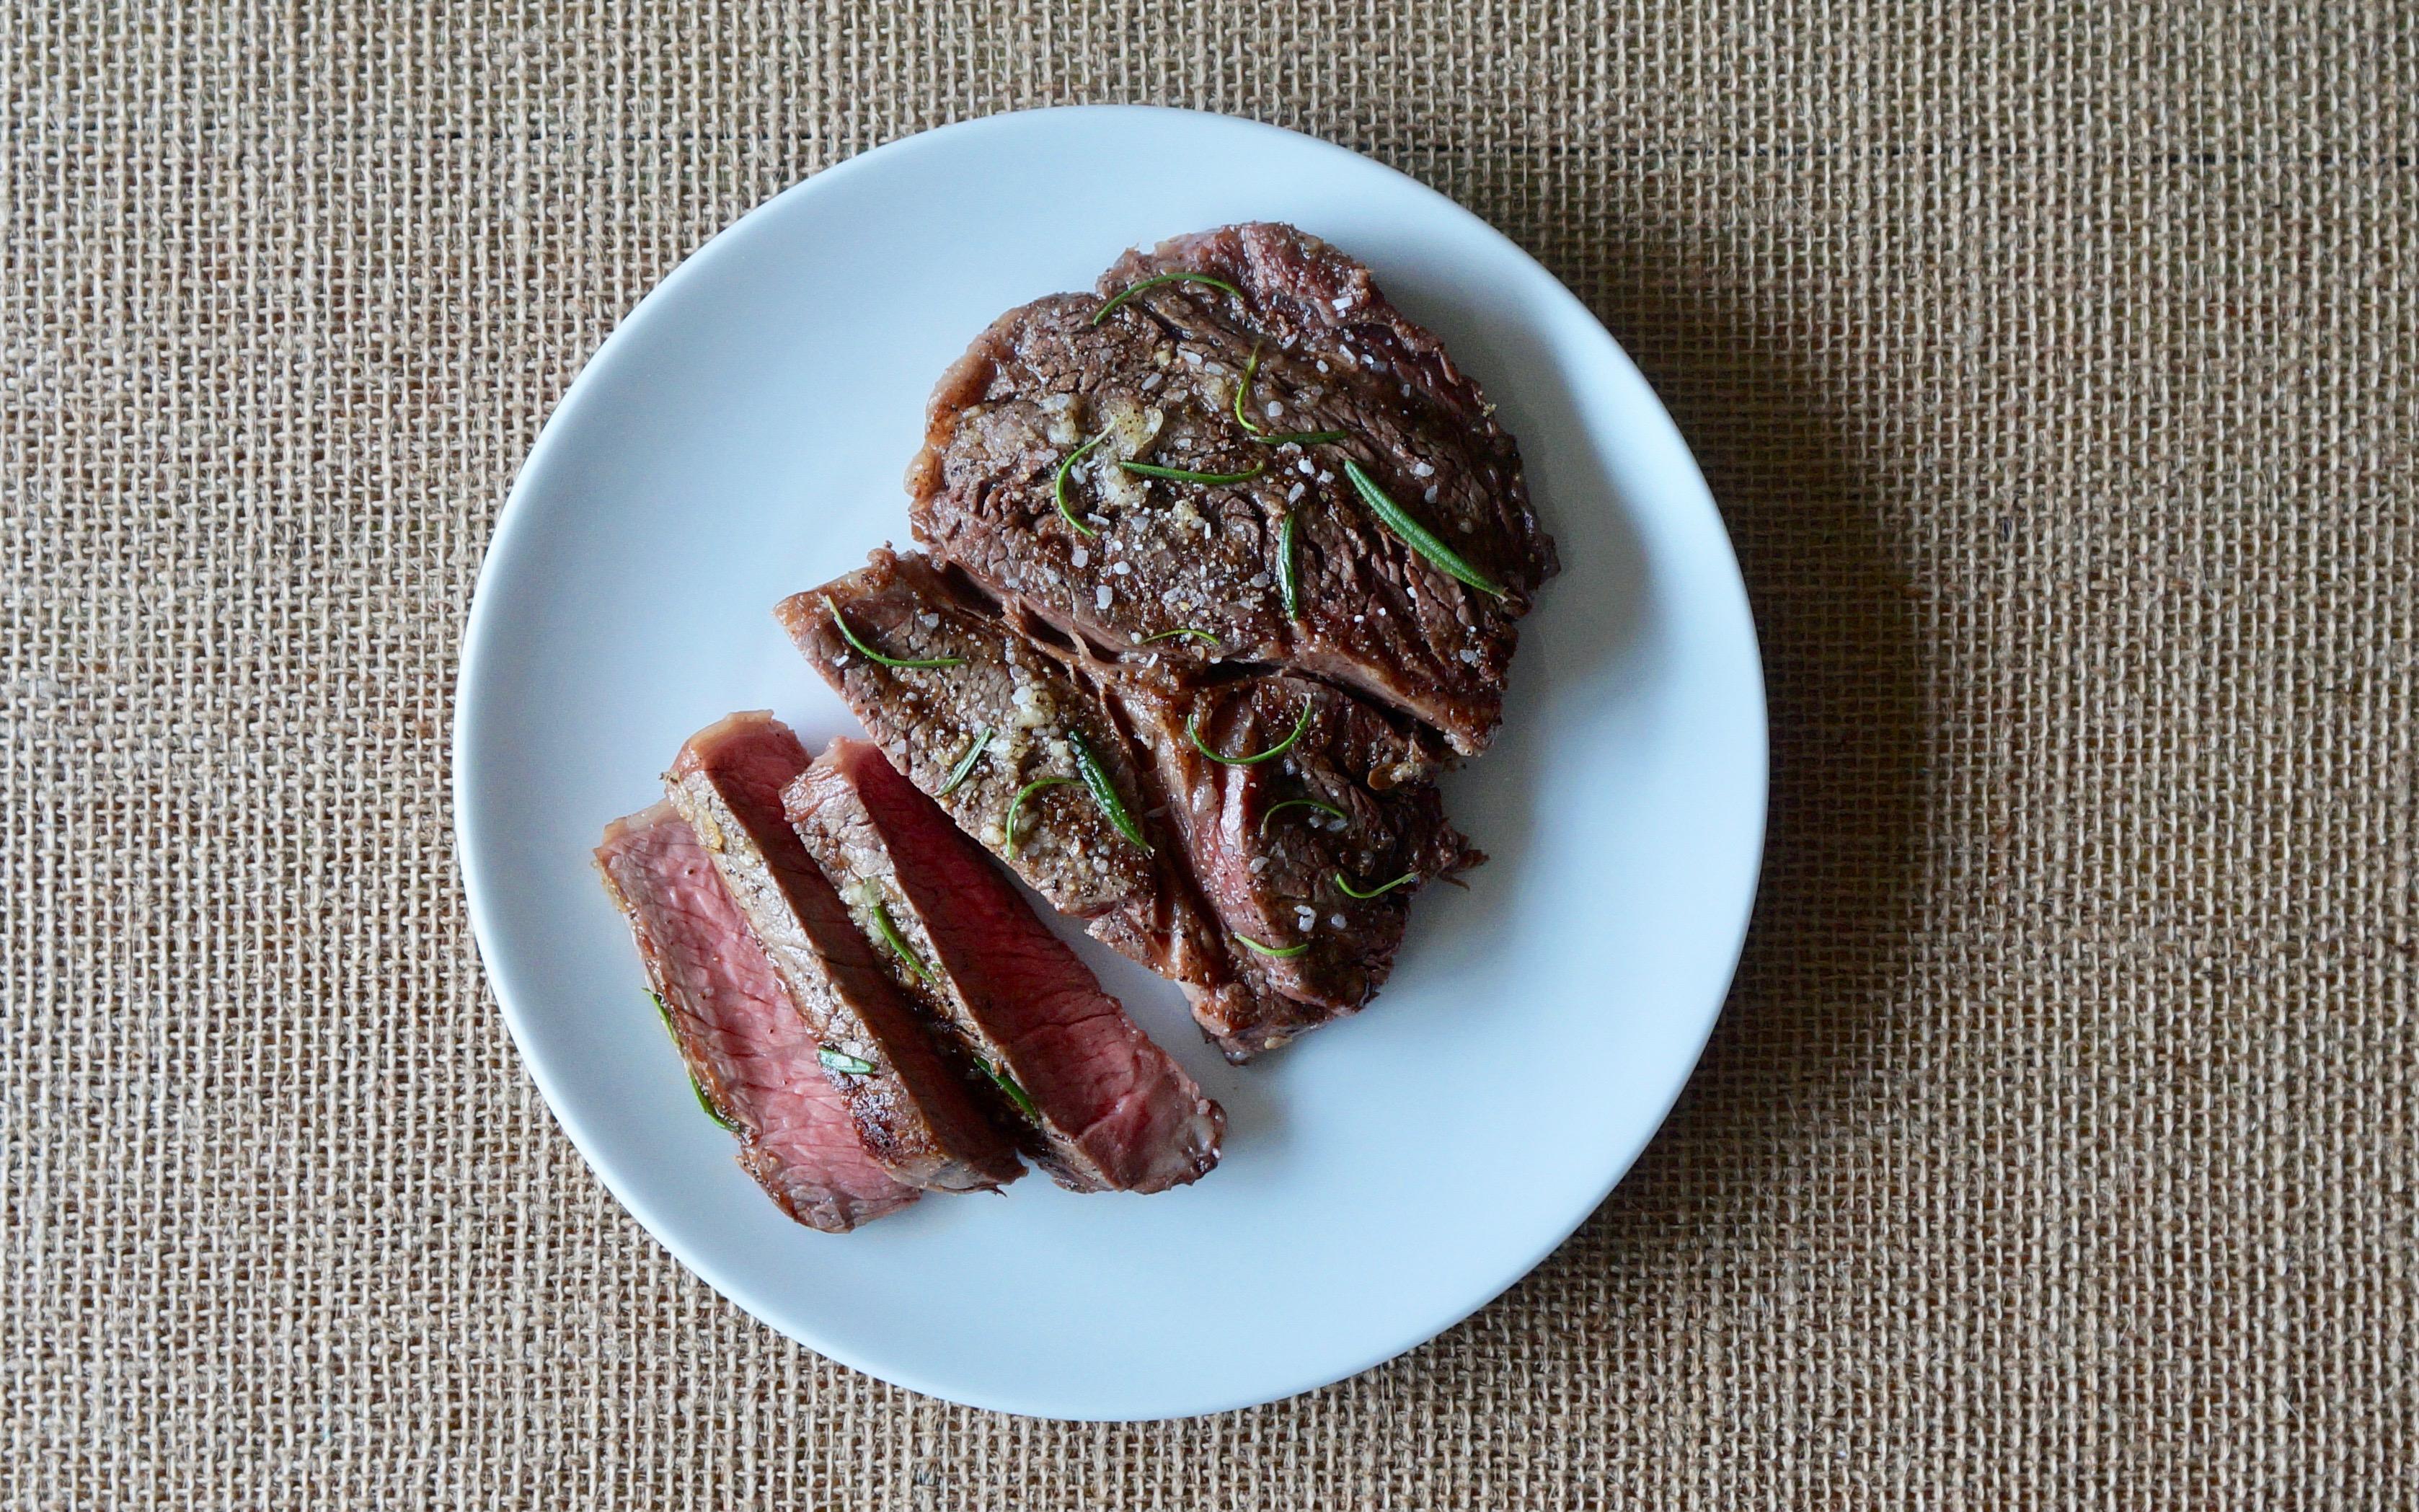 Steak-Knives-Rebecca-Gordon-Publisher-Buttermilk-Lipstick-Culinary-Entertaining-Techniques-Southern-Hostess-RebeccaGordon-Pastry-Chef-Southern-Entertaining-Birmingham-Alabama